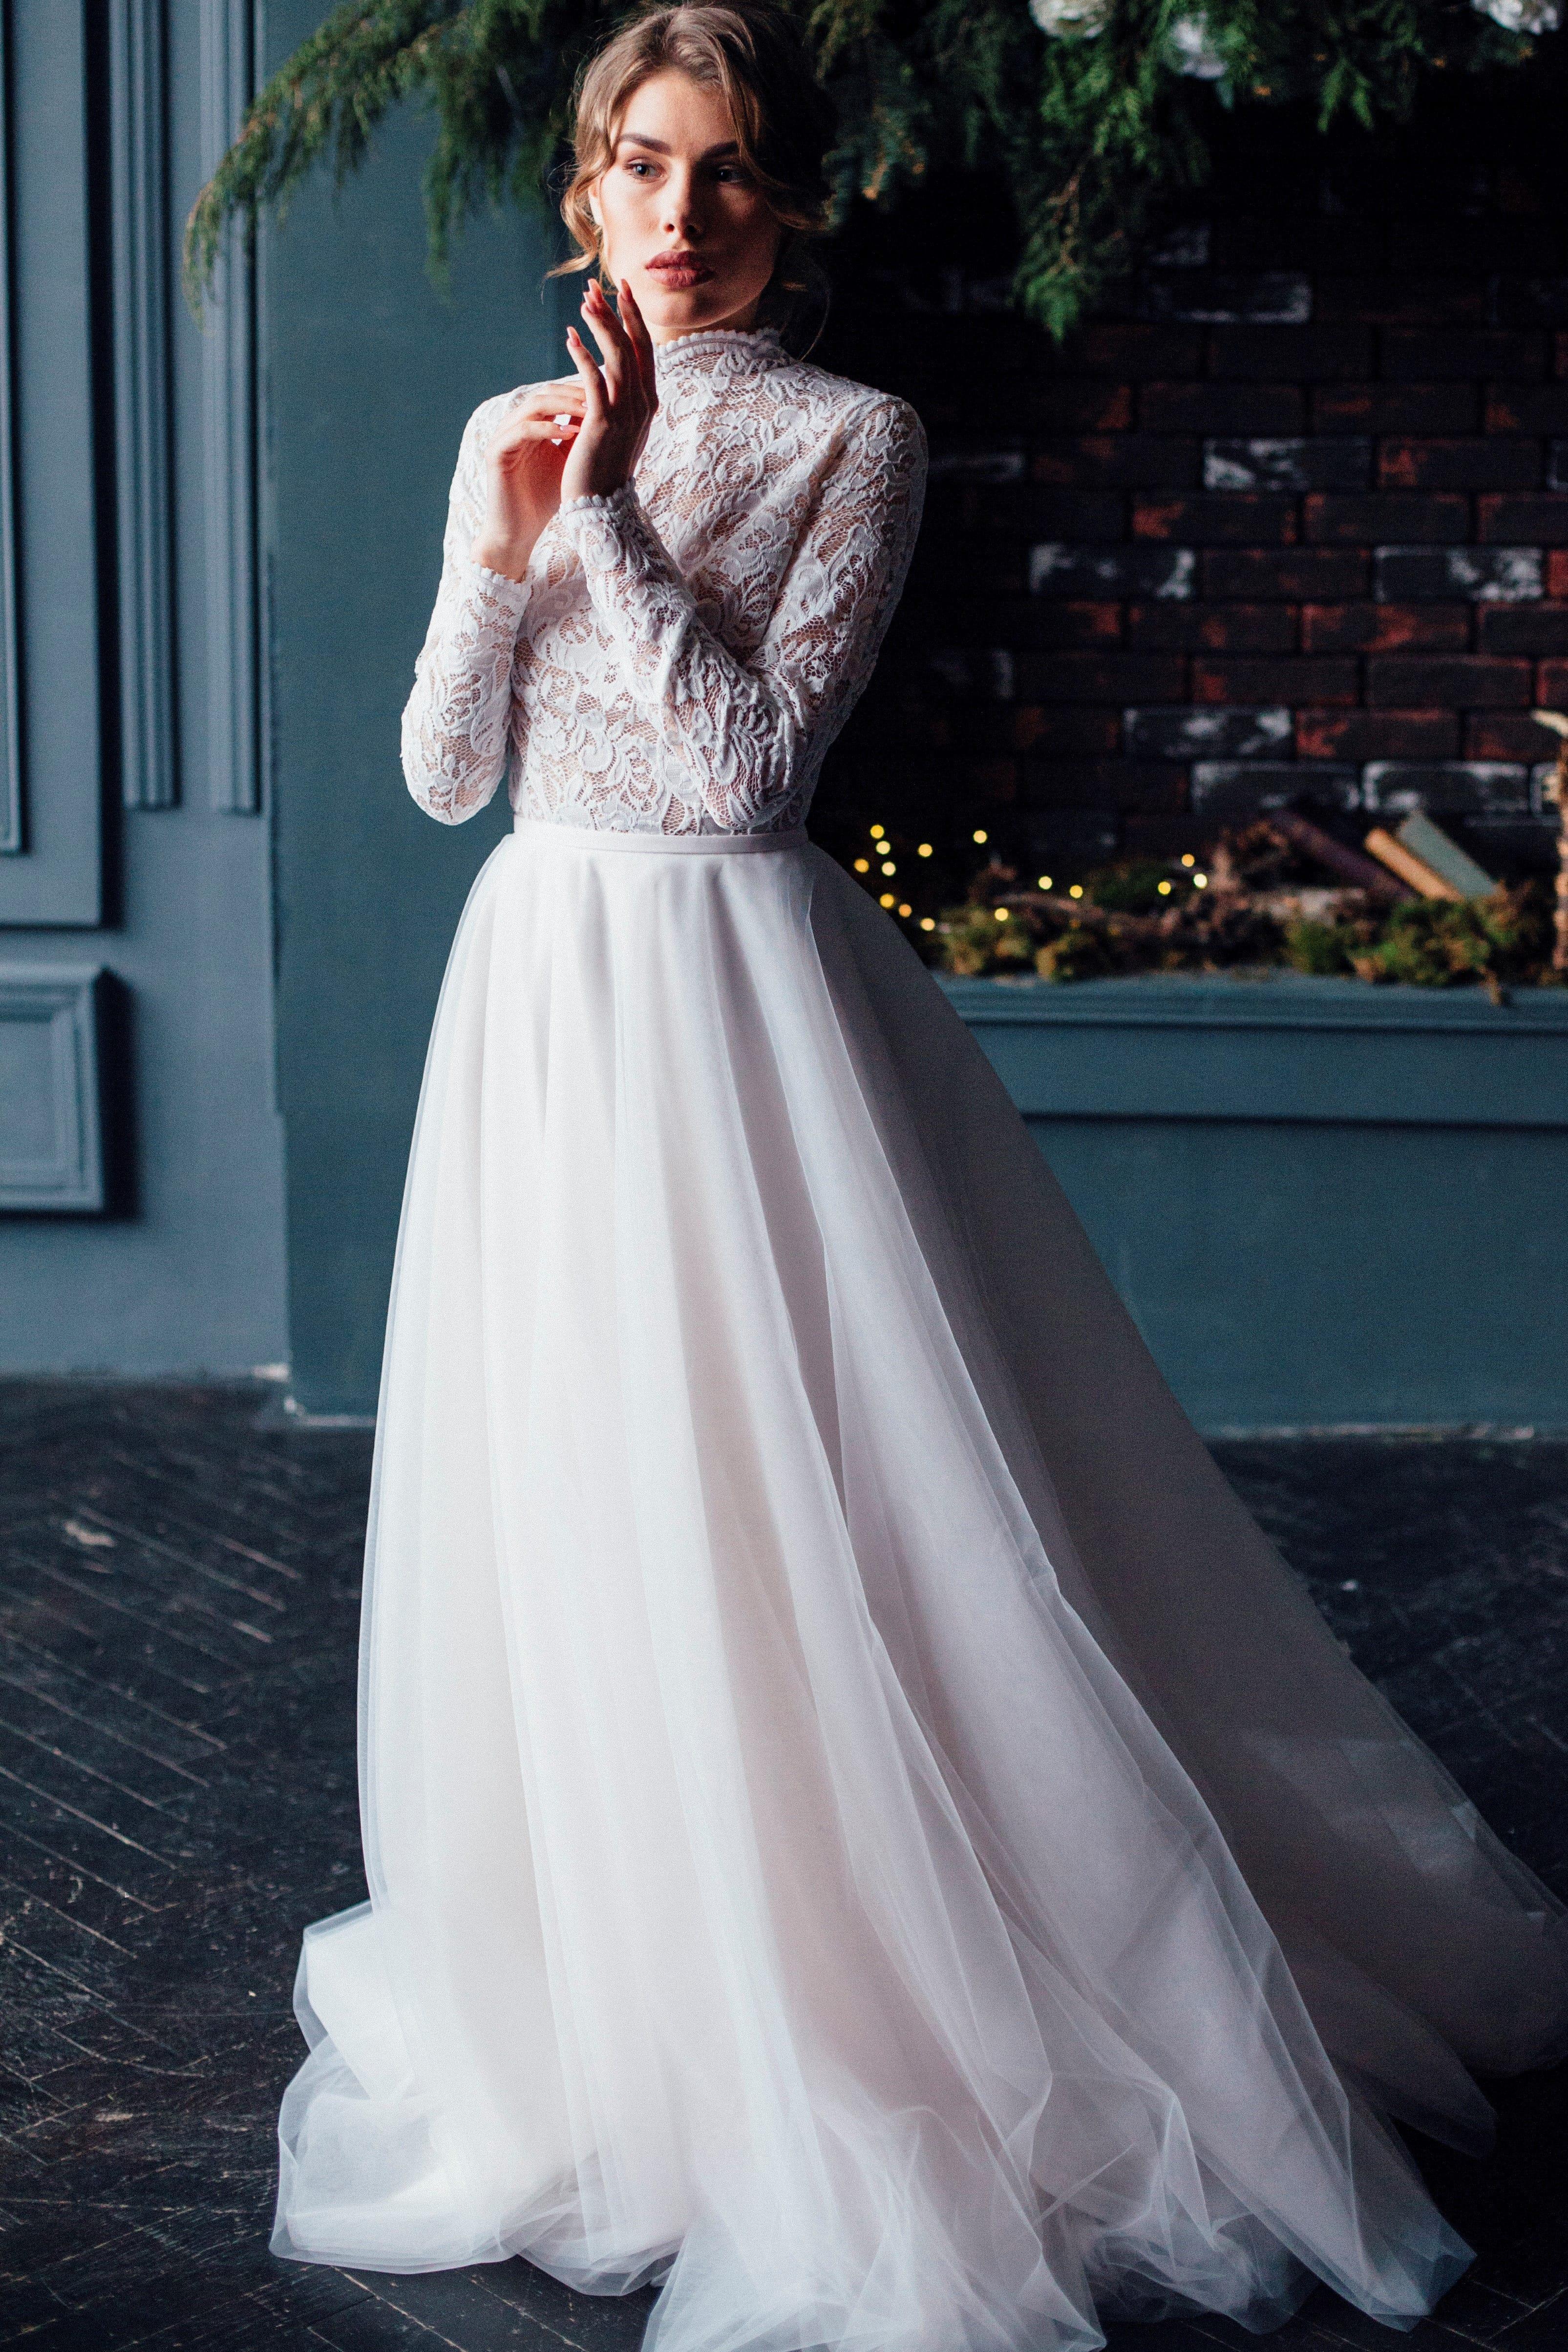 Свадебное платье KIMBERLY, коллекция THE ABSOLUTE LOVE, бренд RARE BRIDAL, фото 2